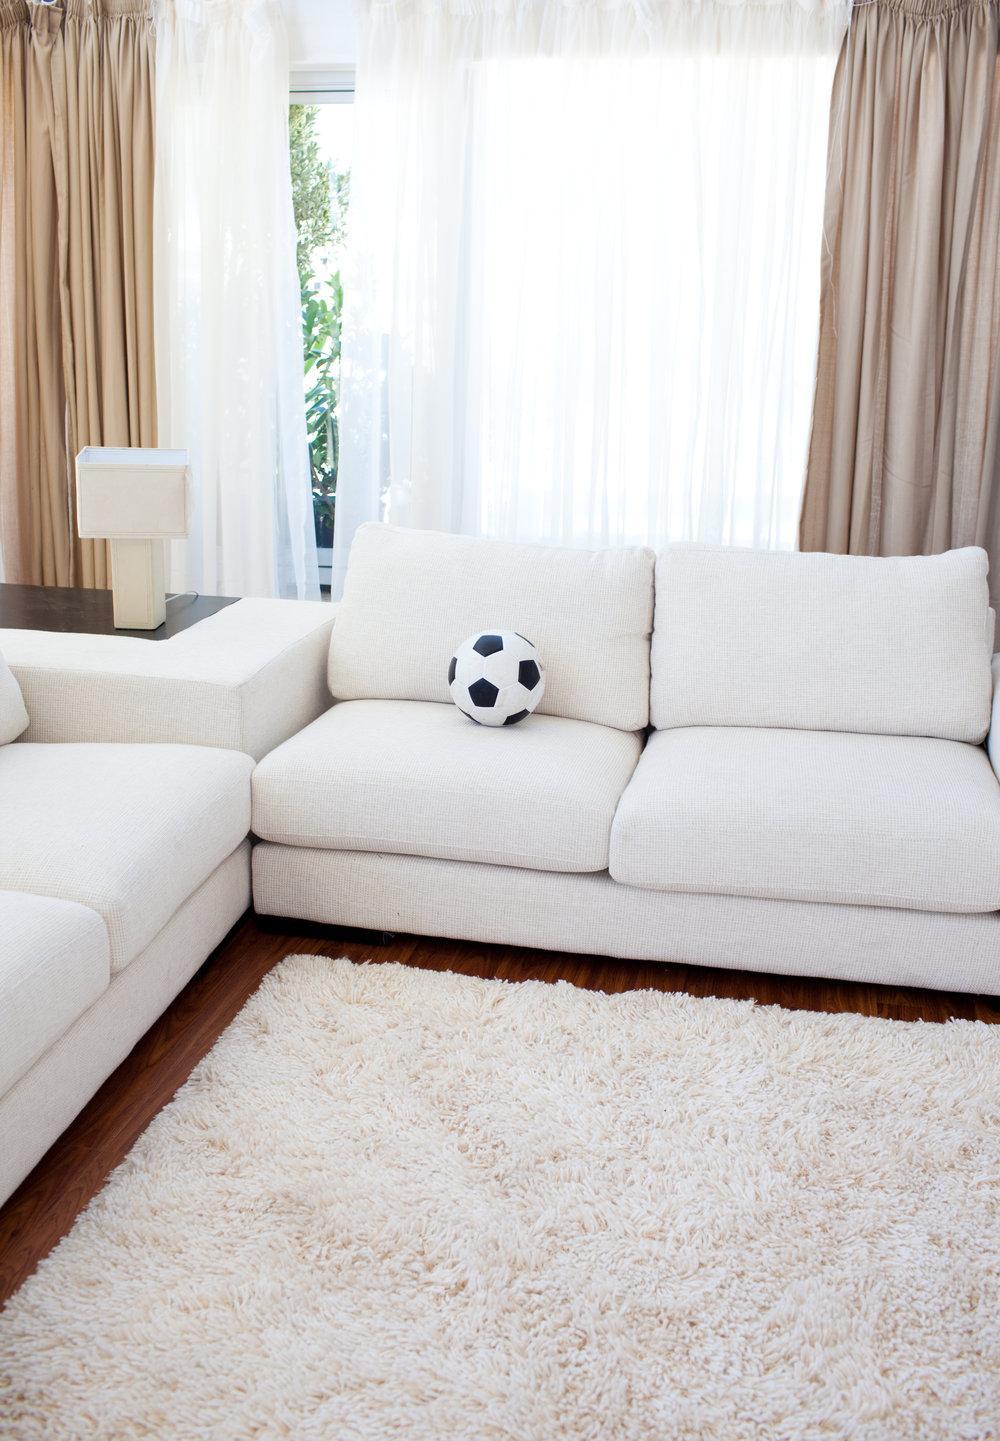 Tapiceria en vigo tapiceros en vigo tapizar sof en vigo for Decoracion hogar vigo